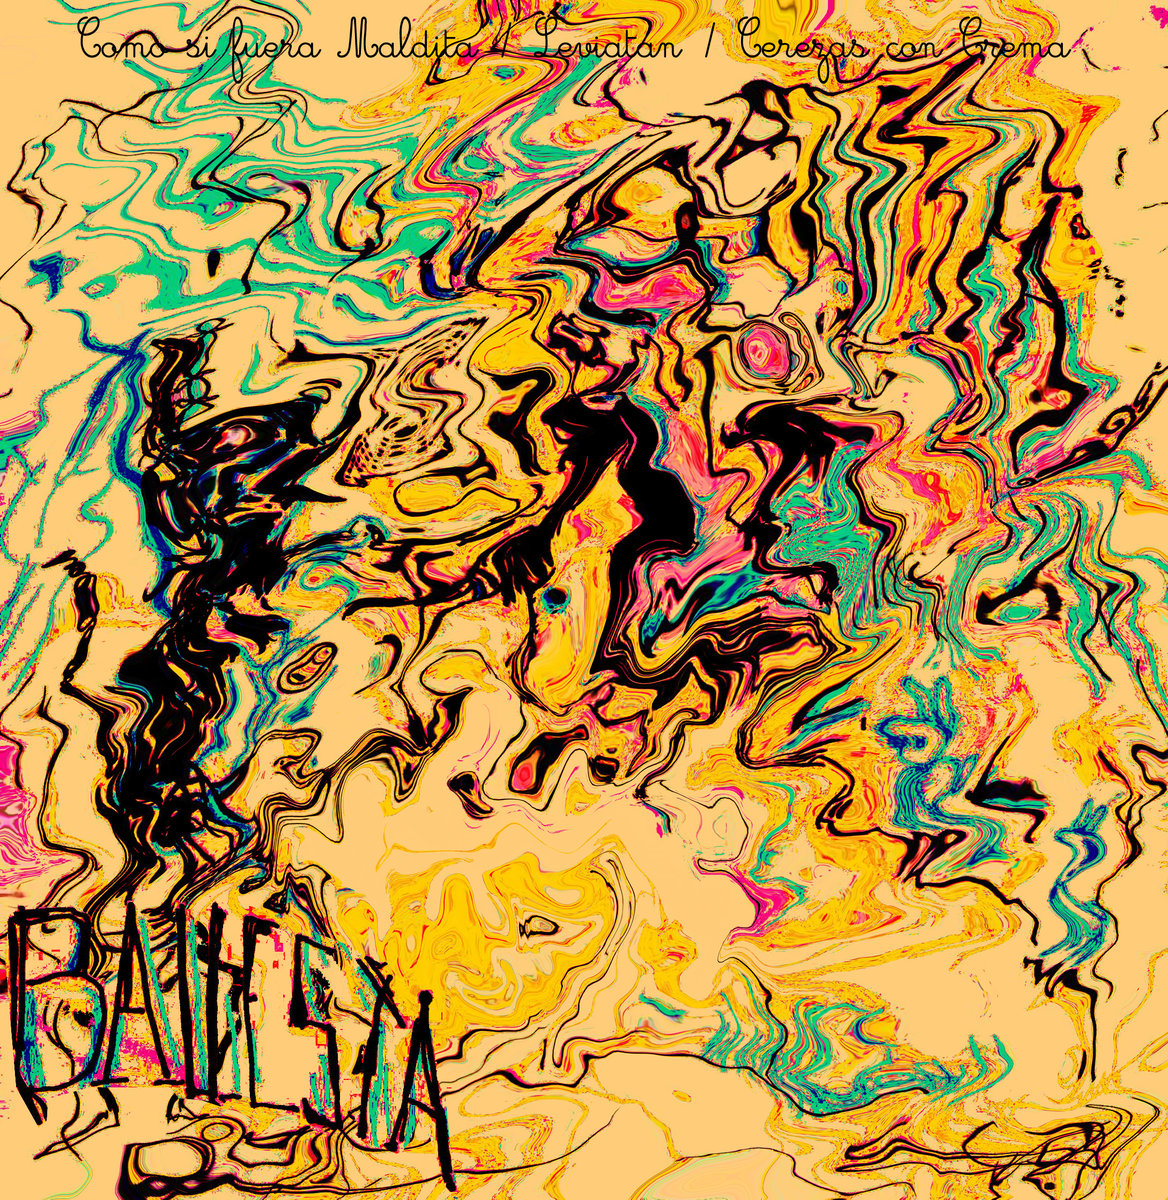 ballesta-simple-xx